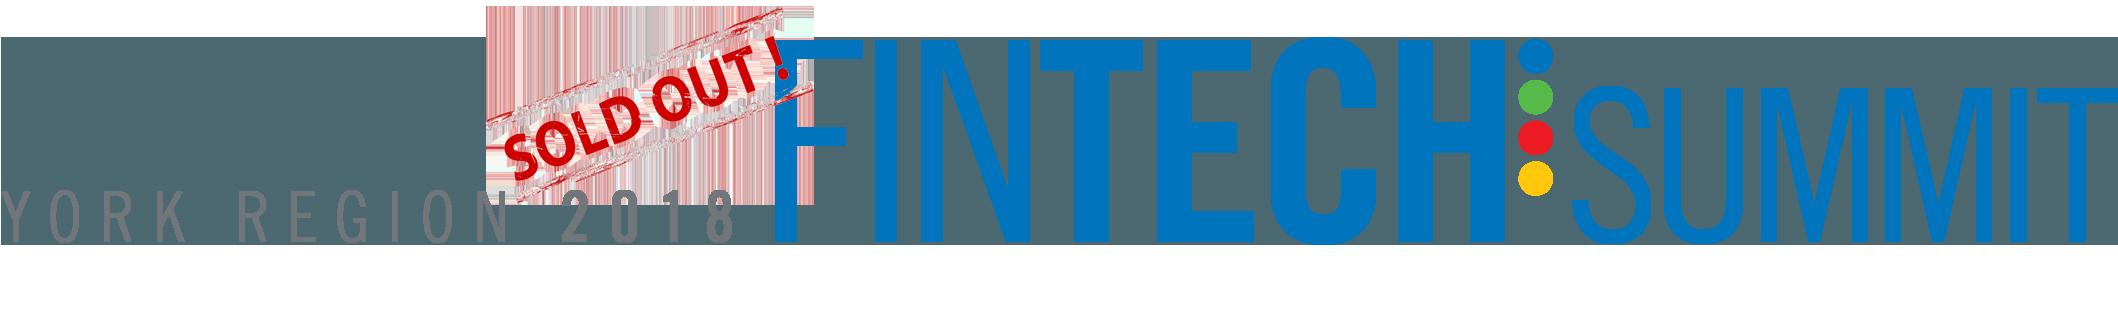 York Region 2018 FinTech Summit